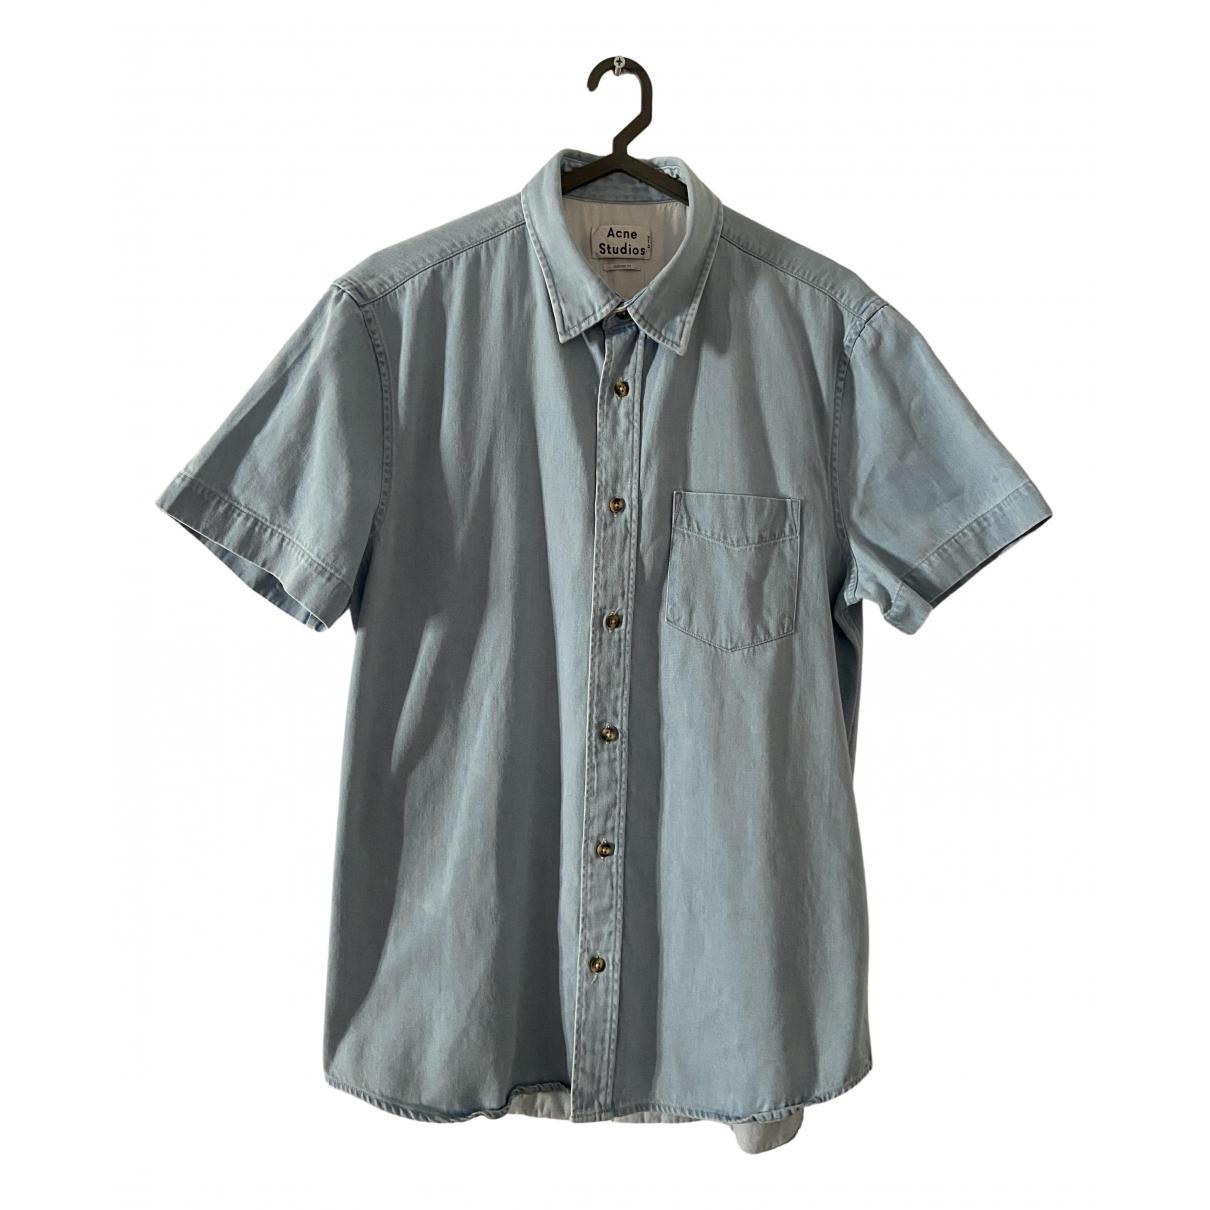 Acne Studios N Blue Denim - Jeans Shirts for Men M International